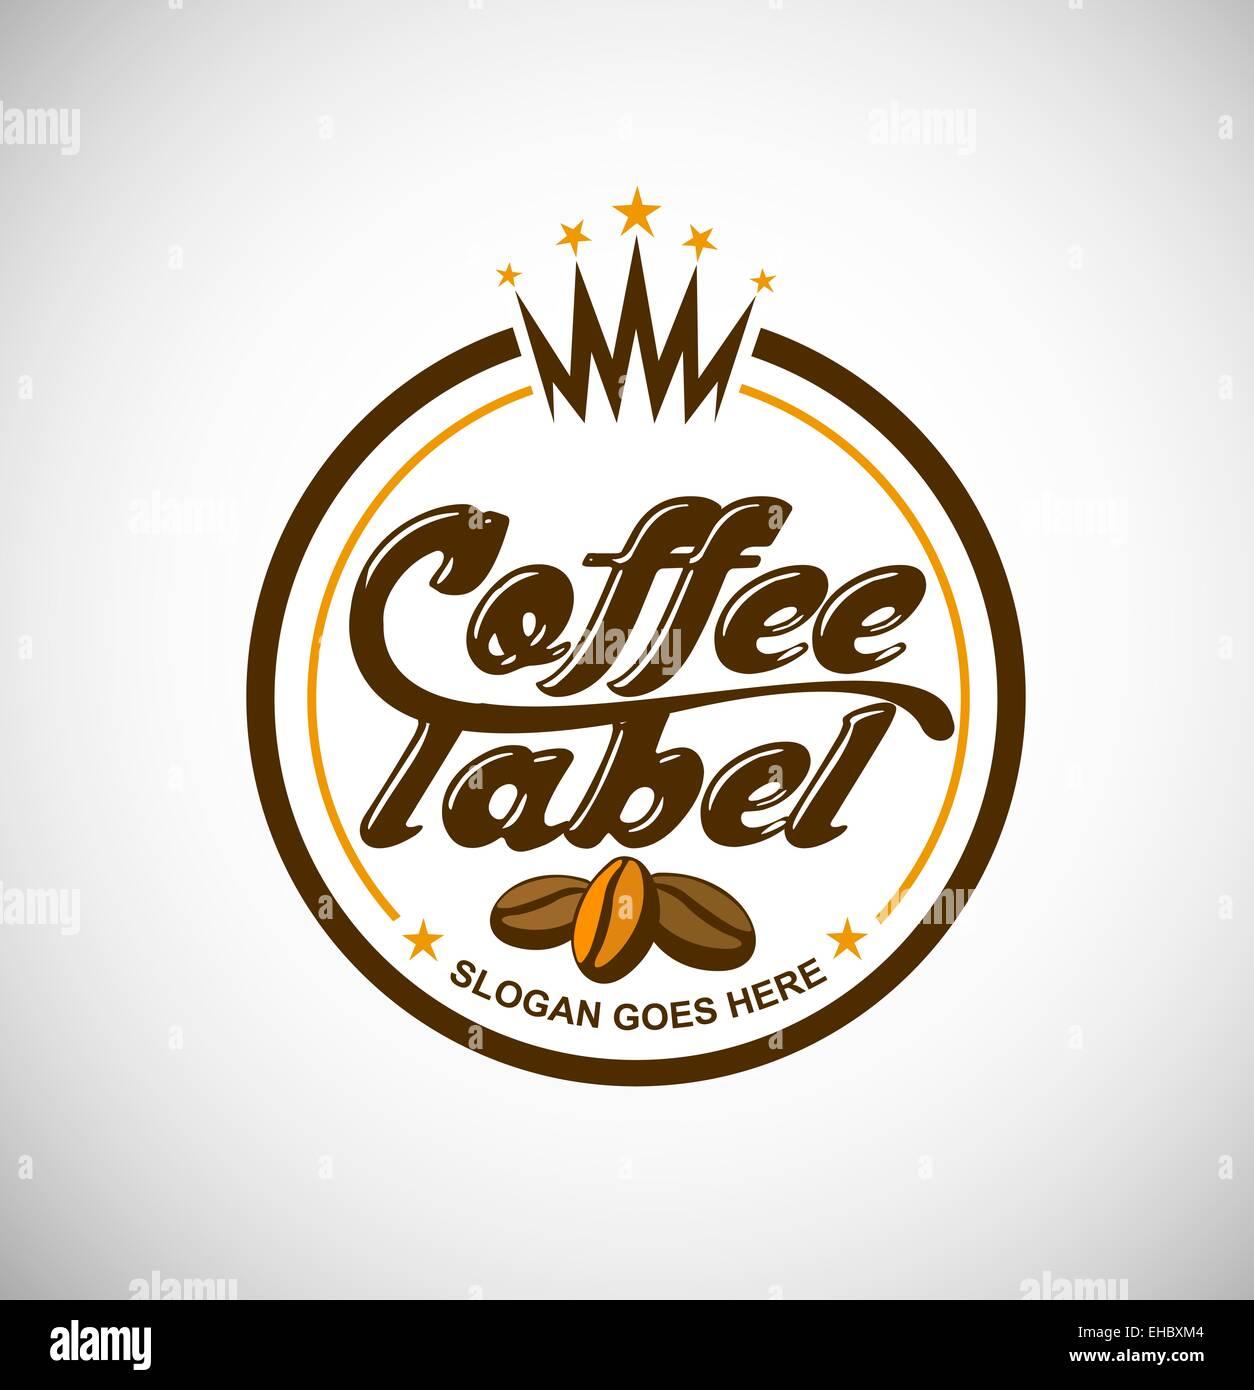 Coffee logo vector creative label for a a coffee business stock creative label for a a coffee business buycottarizona